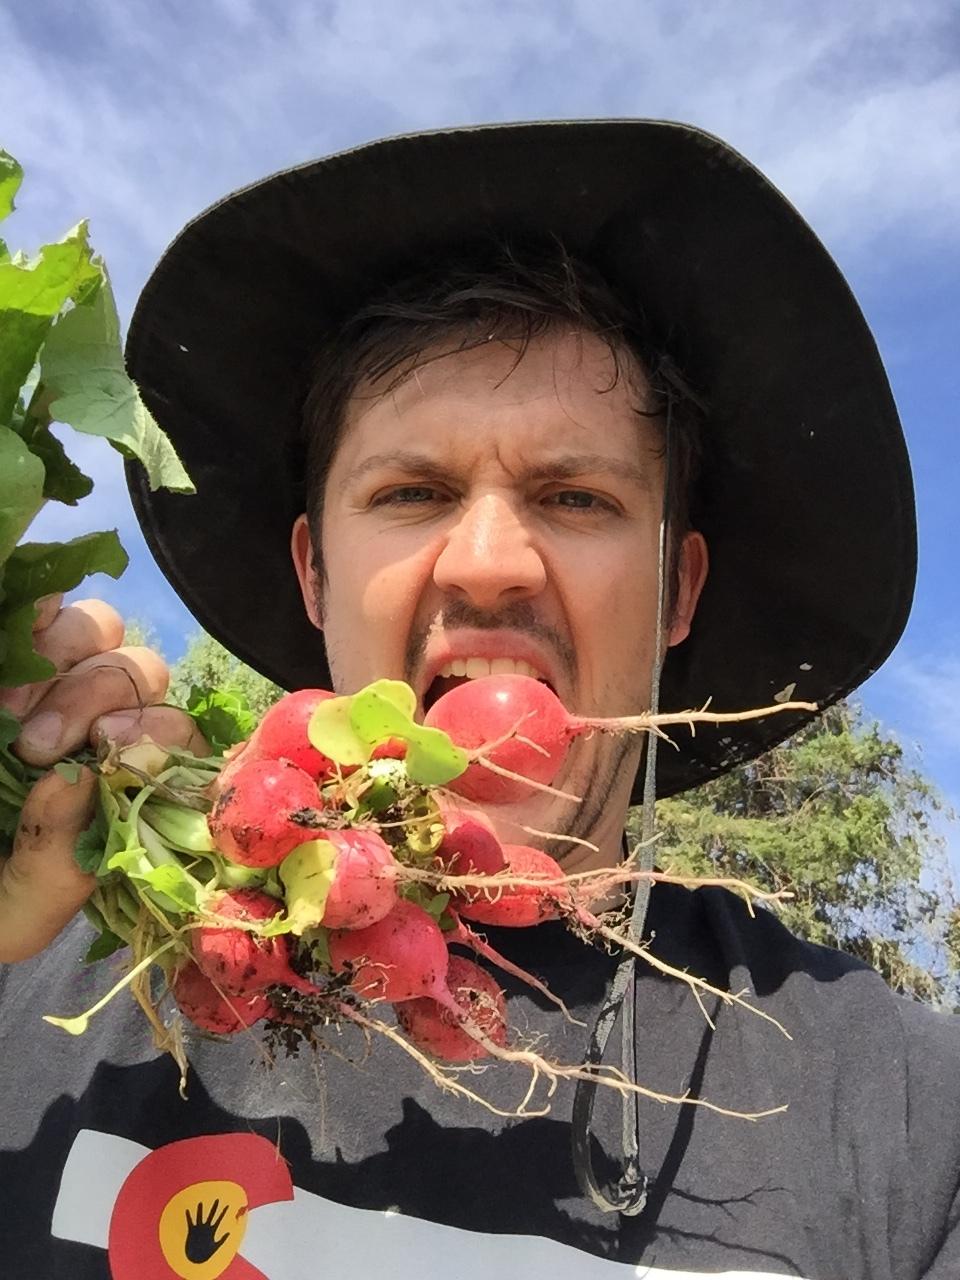 radish harvest 1.JPG